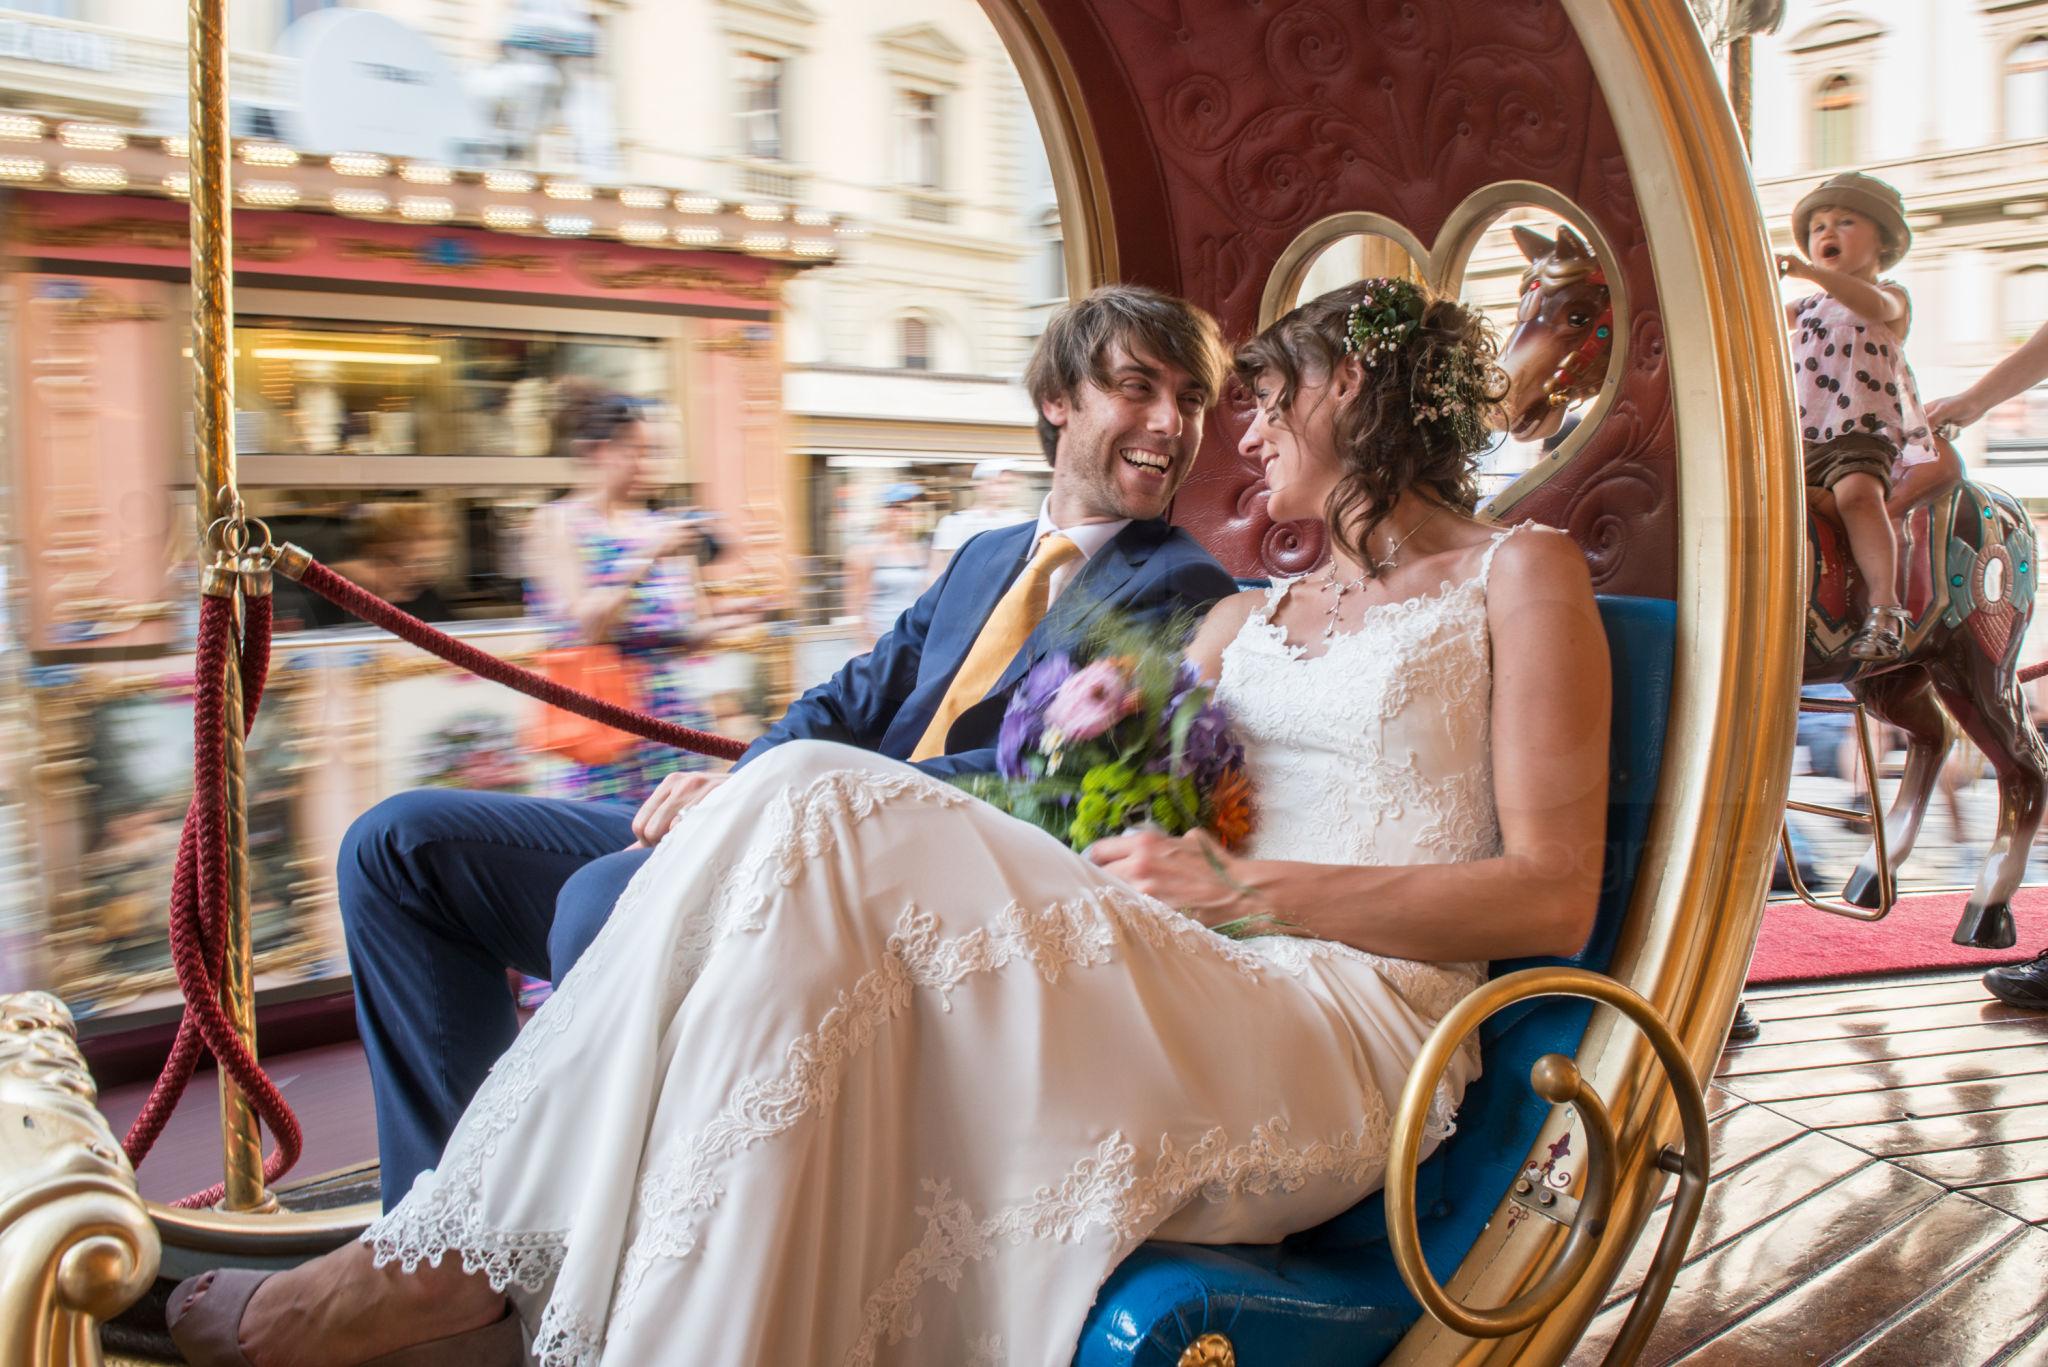 https://lnx.mirkone.it/wp-content/uploads/2015/07/fotografo-matrimoni-faenza-0027-2.jpg